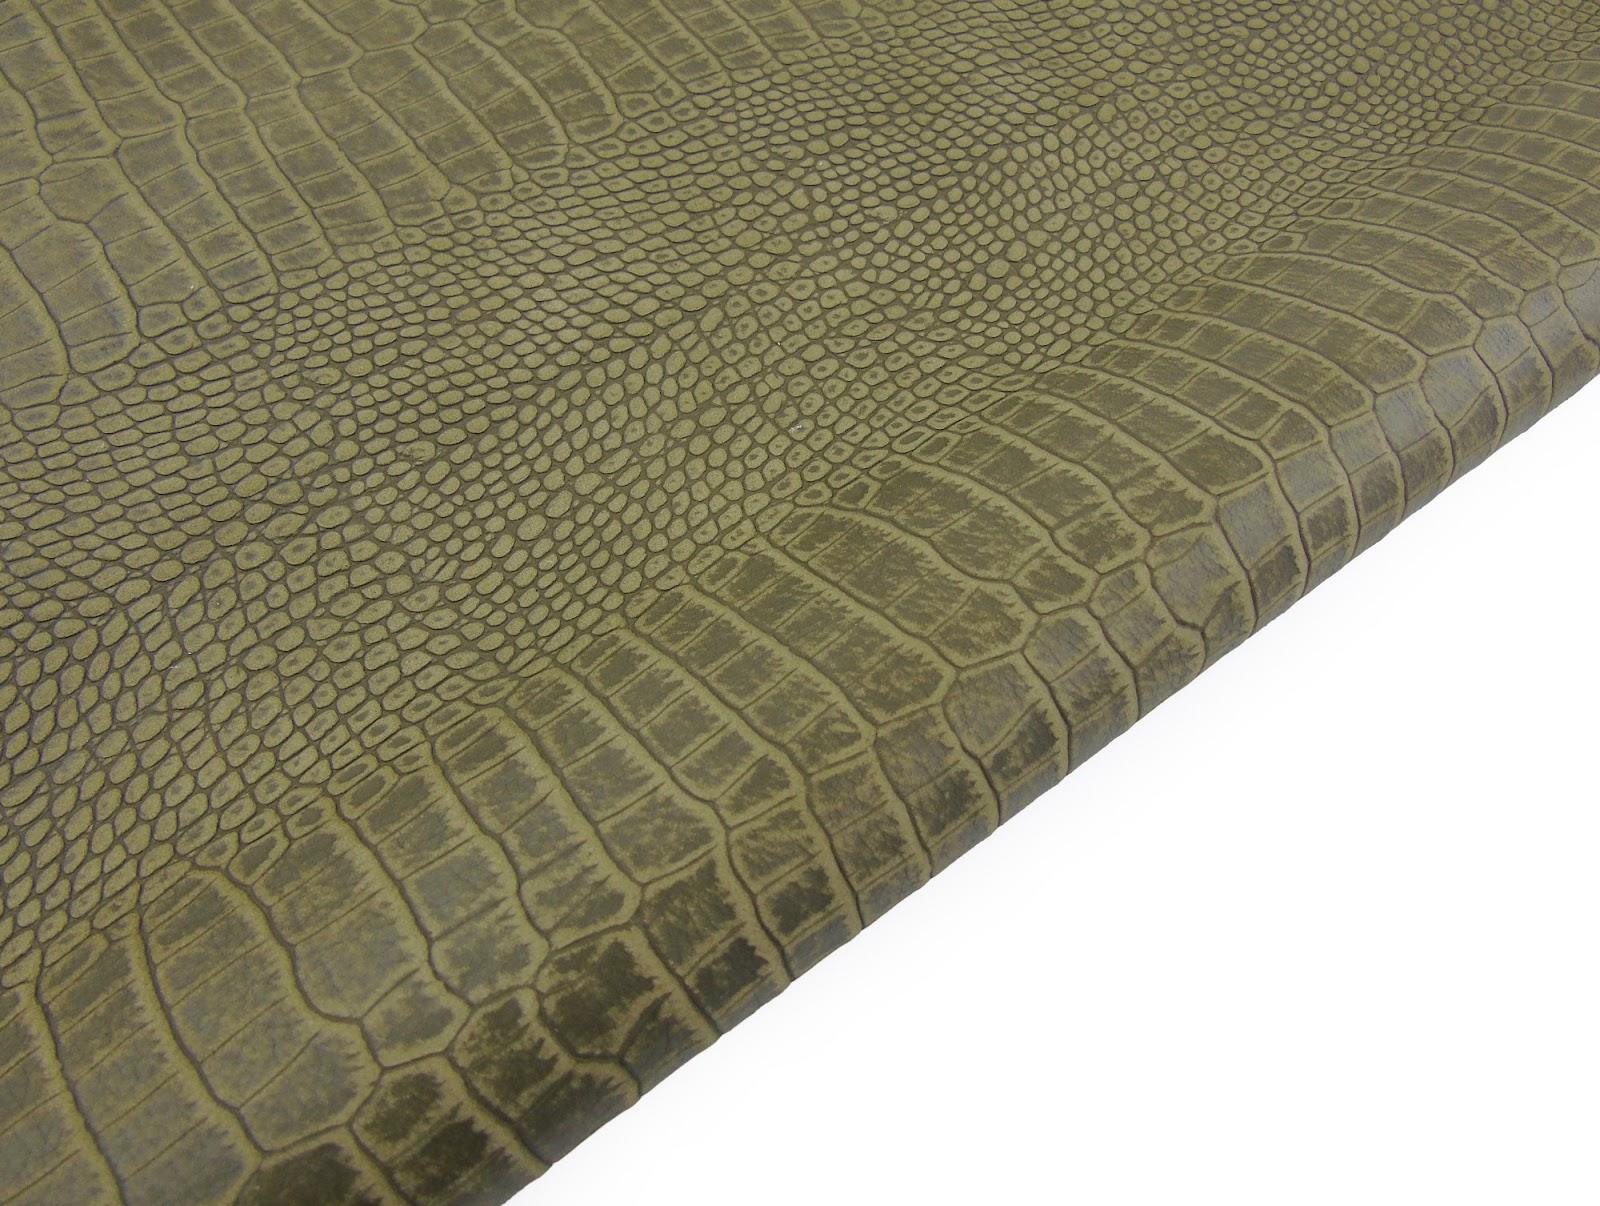 Bristle surface of nubuck leather